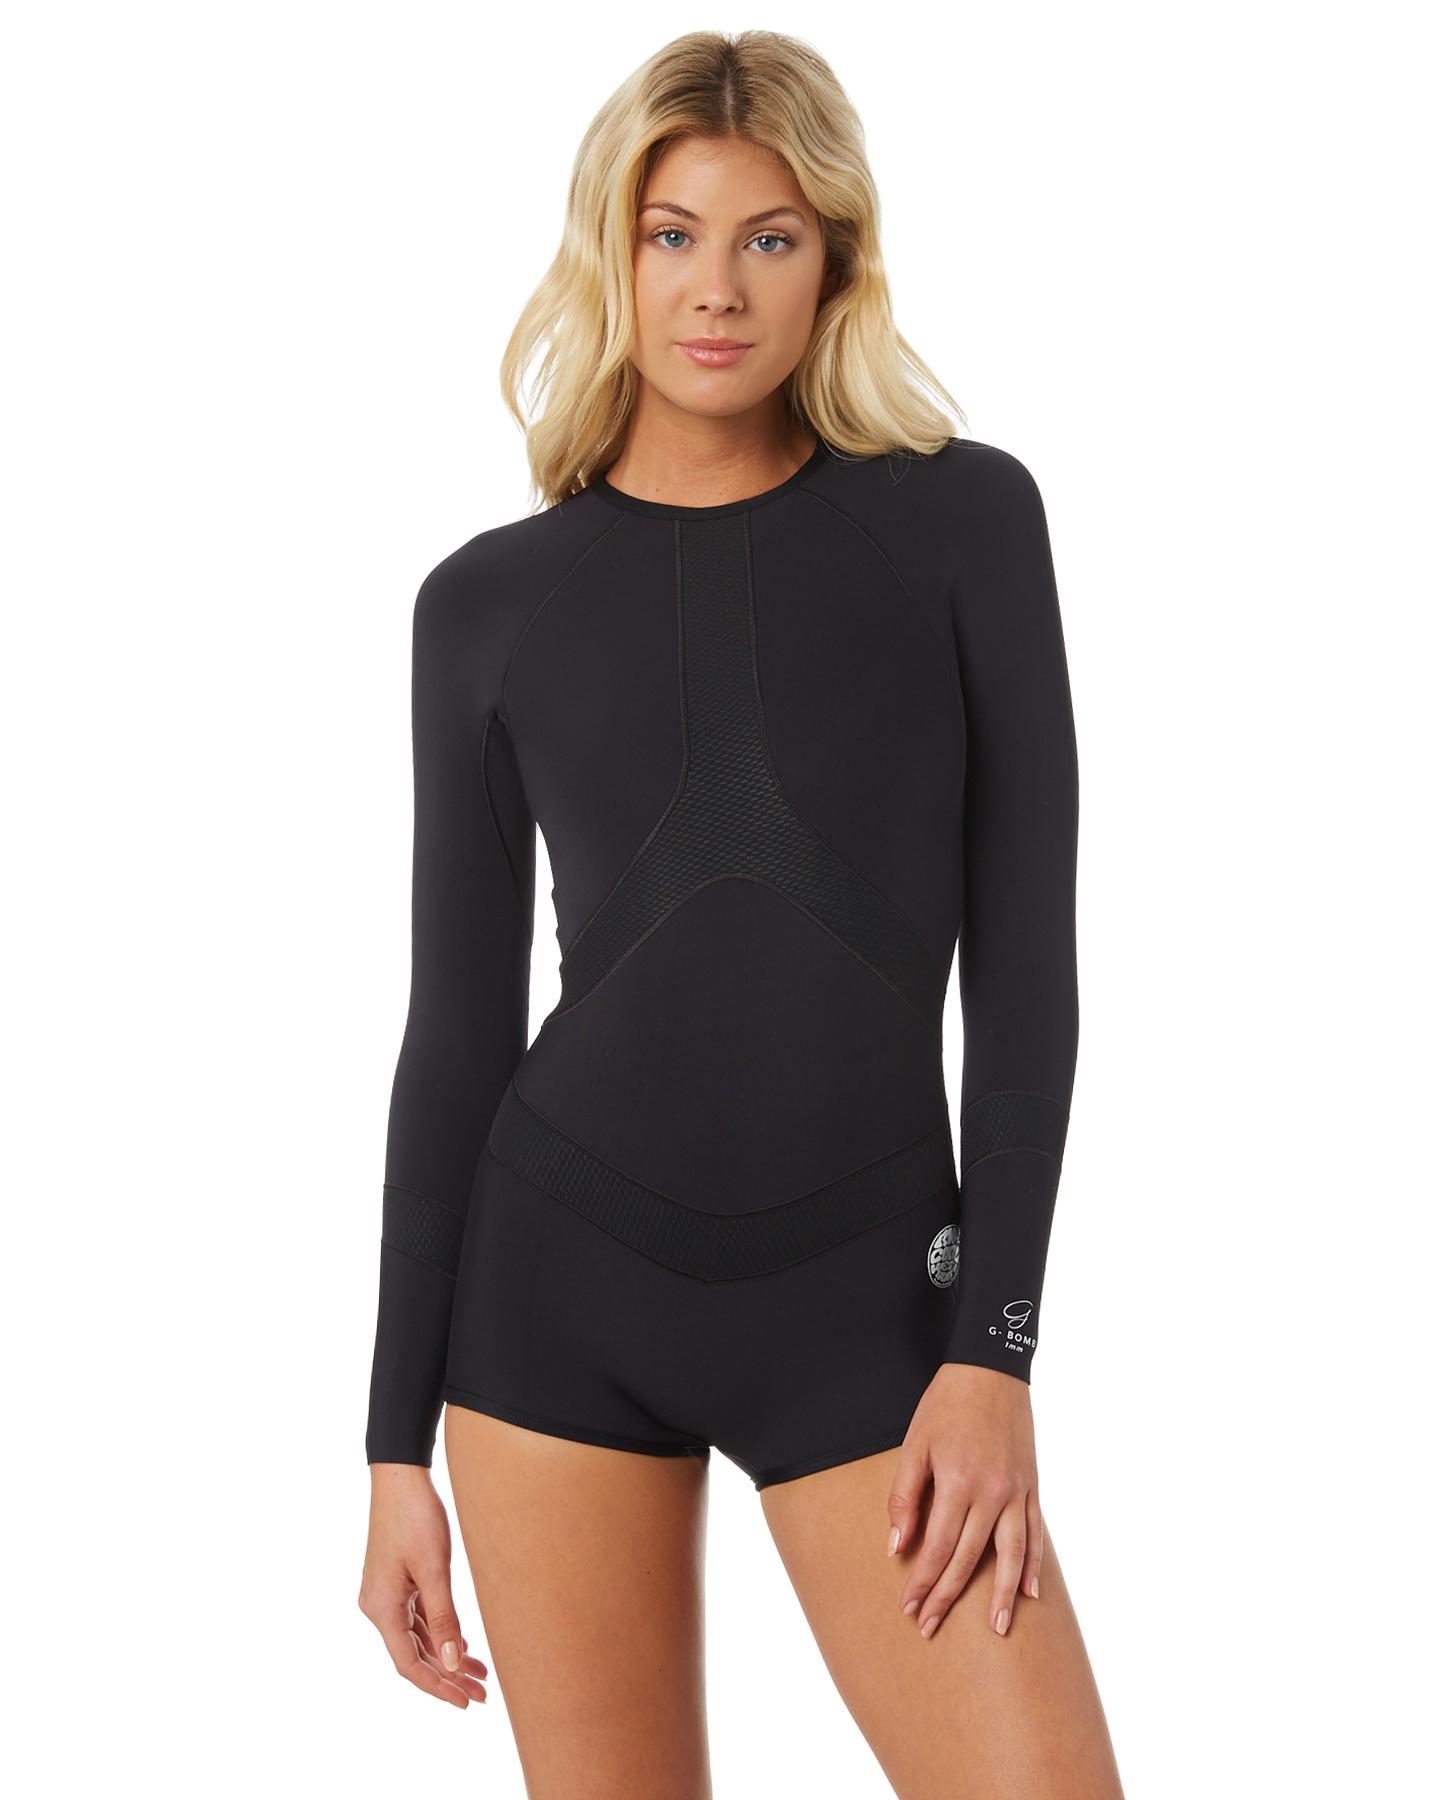 Womens Swimwear One Piece Boyleg Wetsuit Black